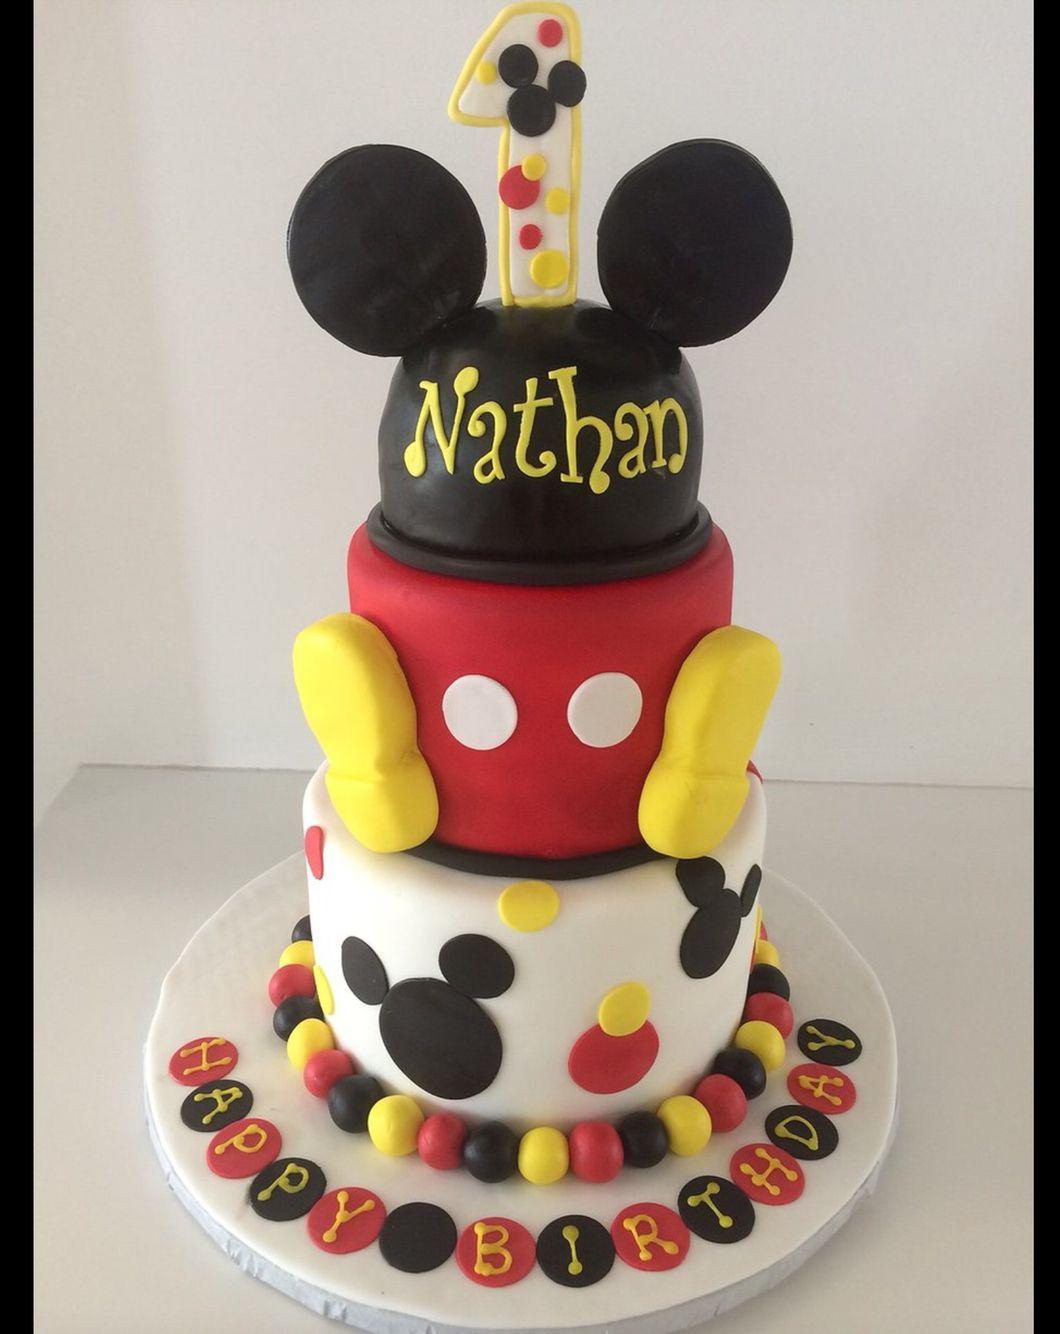 Brandon's cake